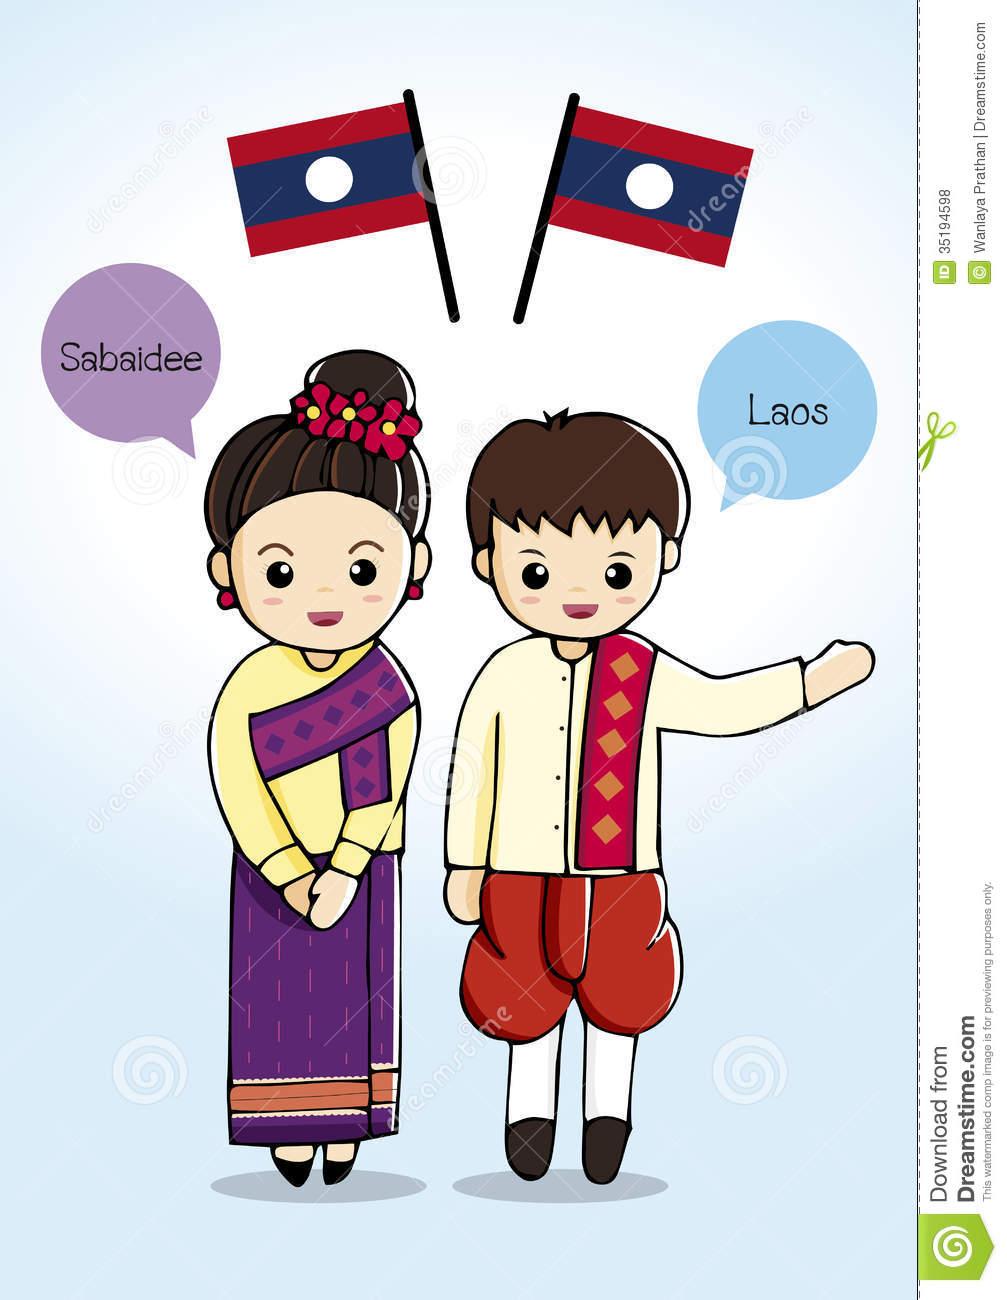 Laos clipart.